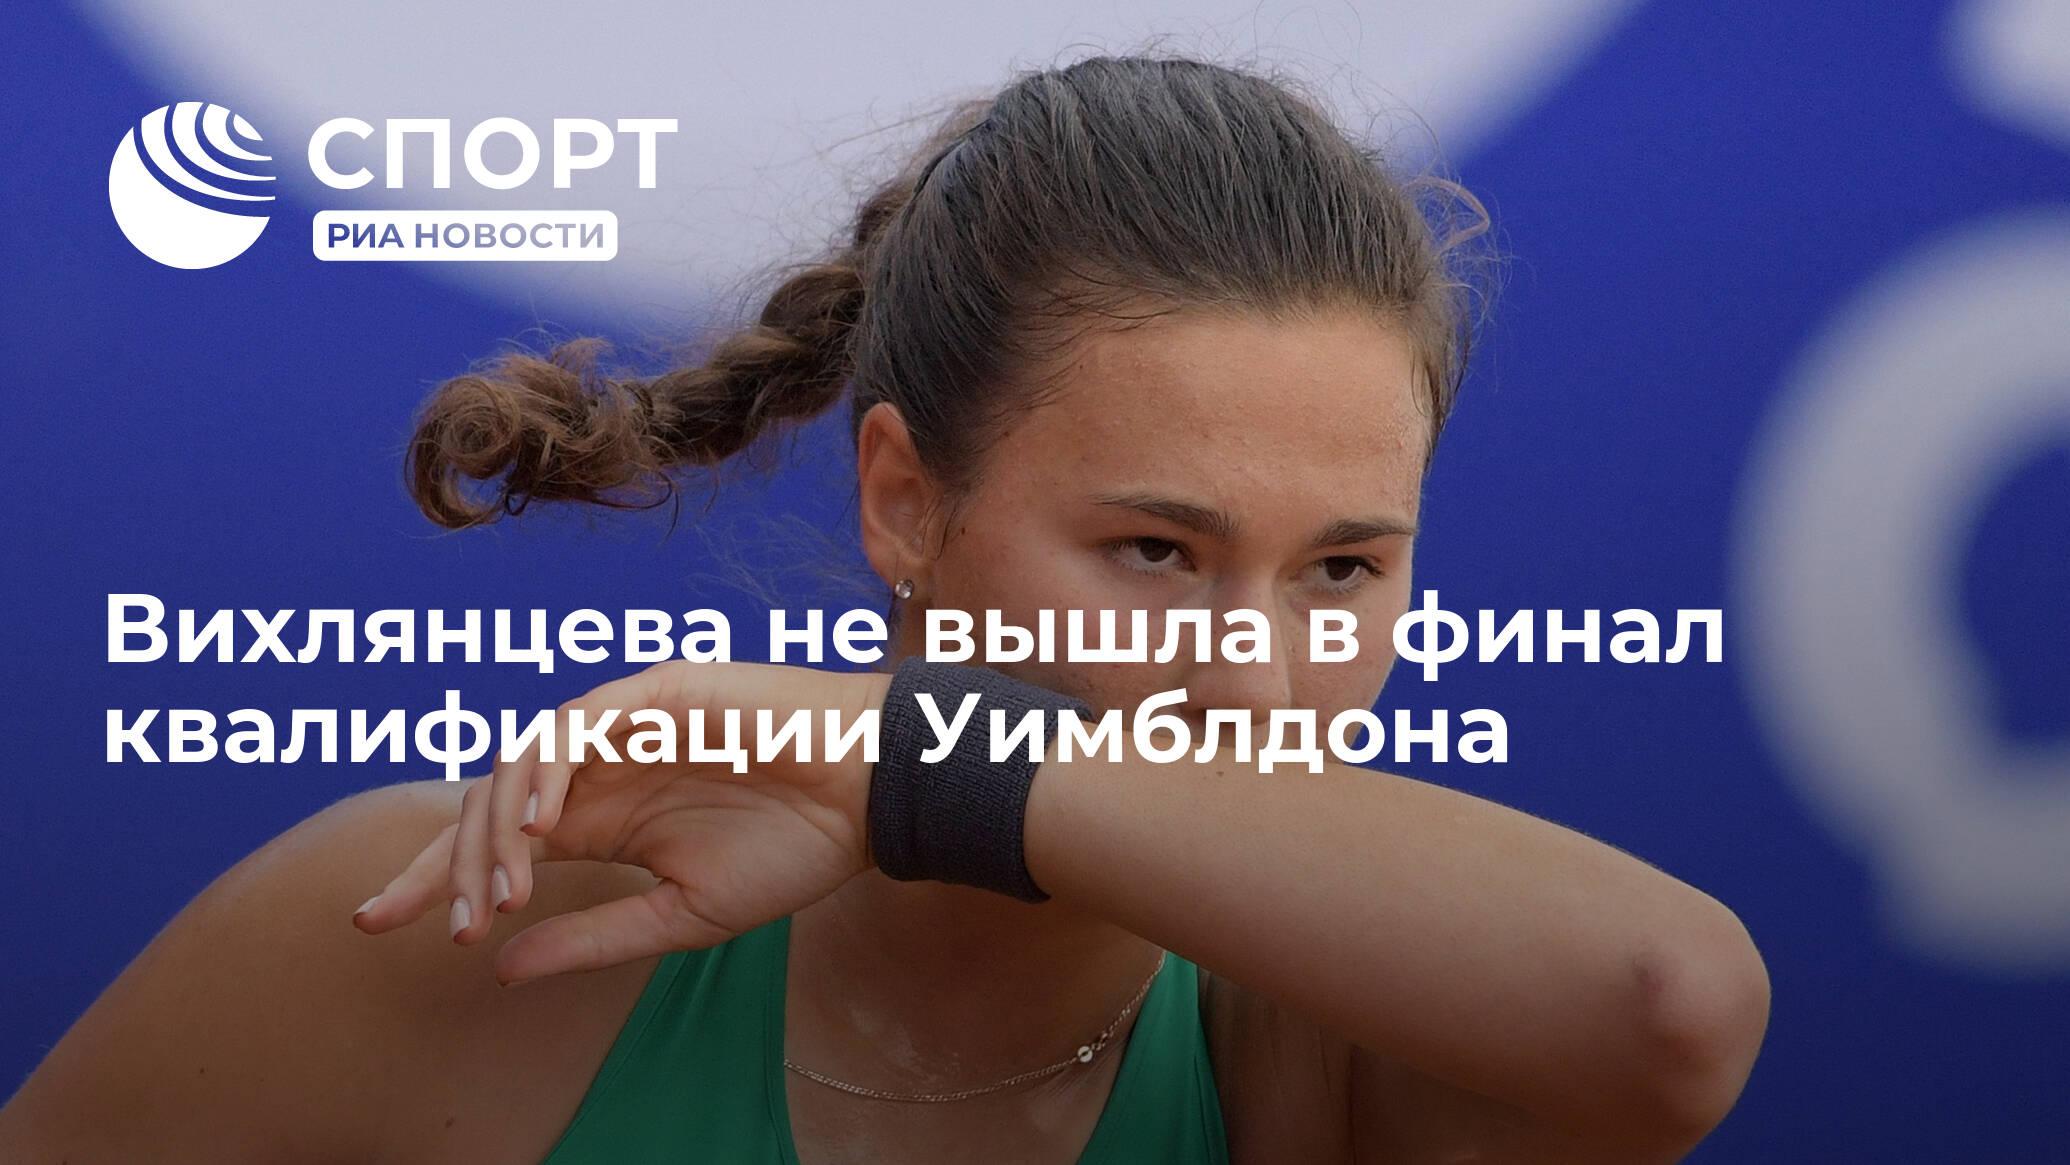 Вихлянцева не вышла в финал квалификации Уимблдона